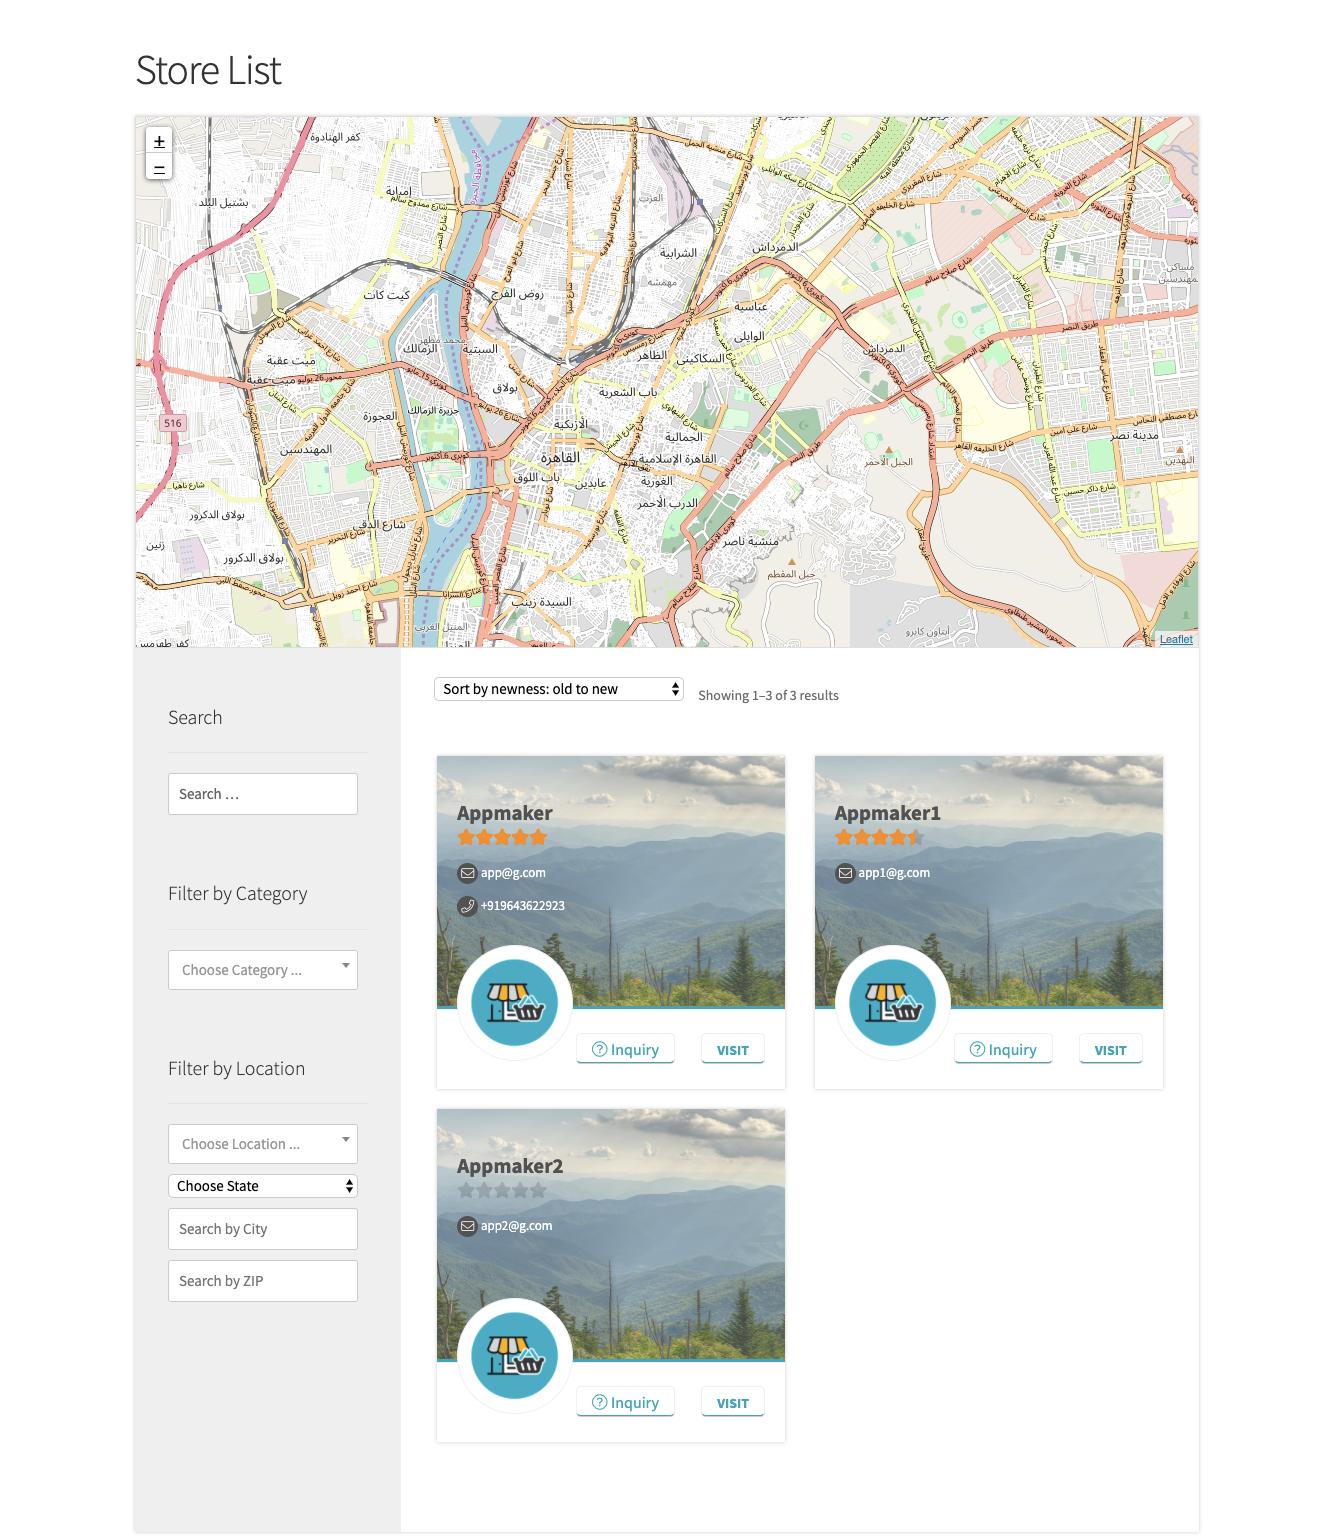 WCFM multivendor plugin - One of the Best Multi-Vendor Marketplace Plugins -  Store list on the website after enabling WCFM multivendor plugin